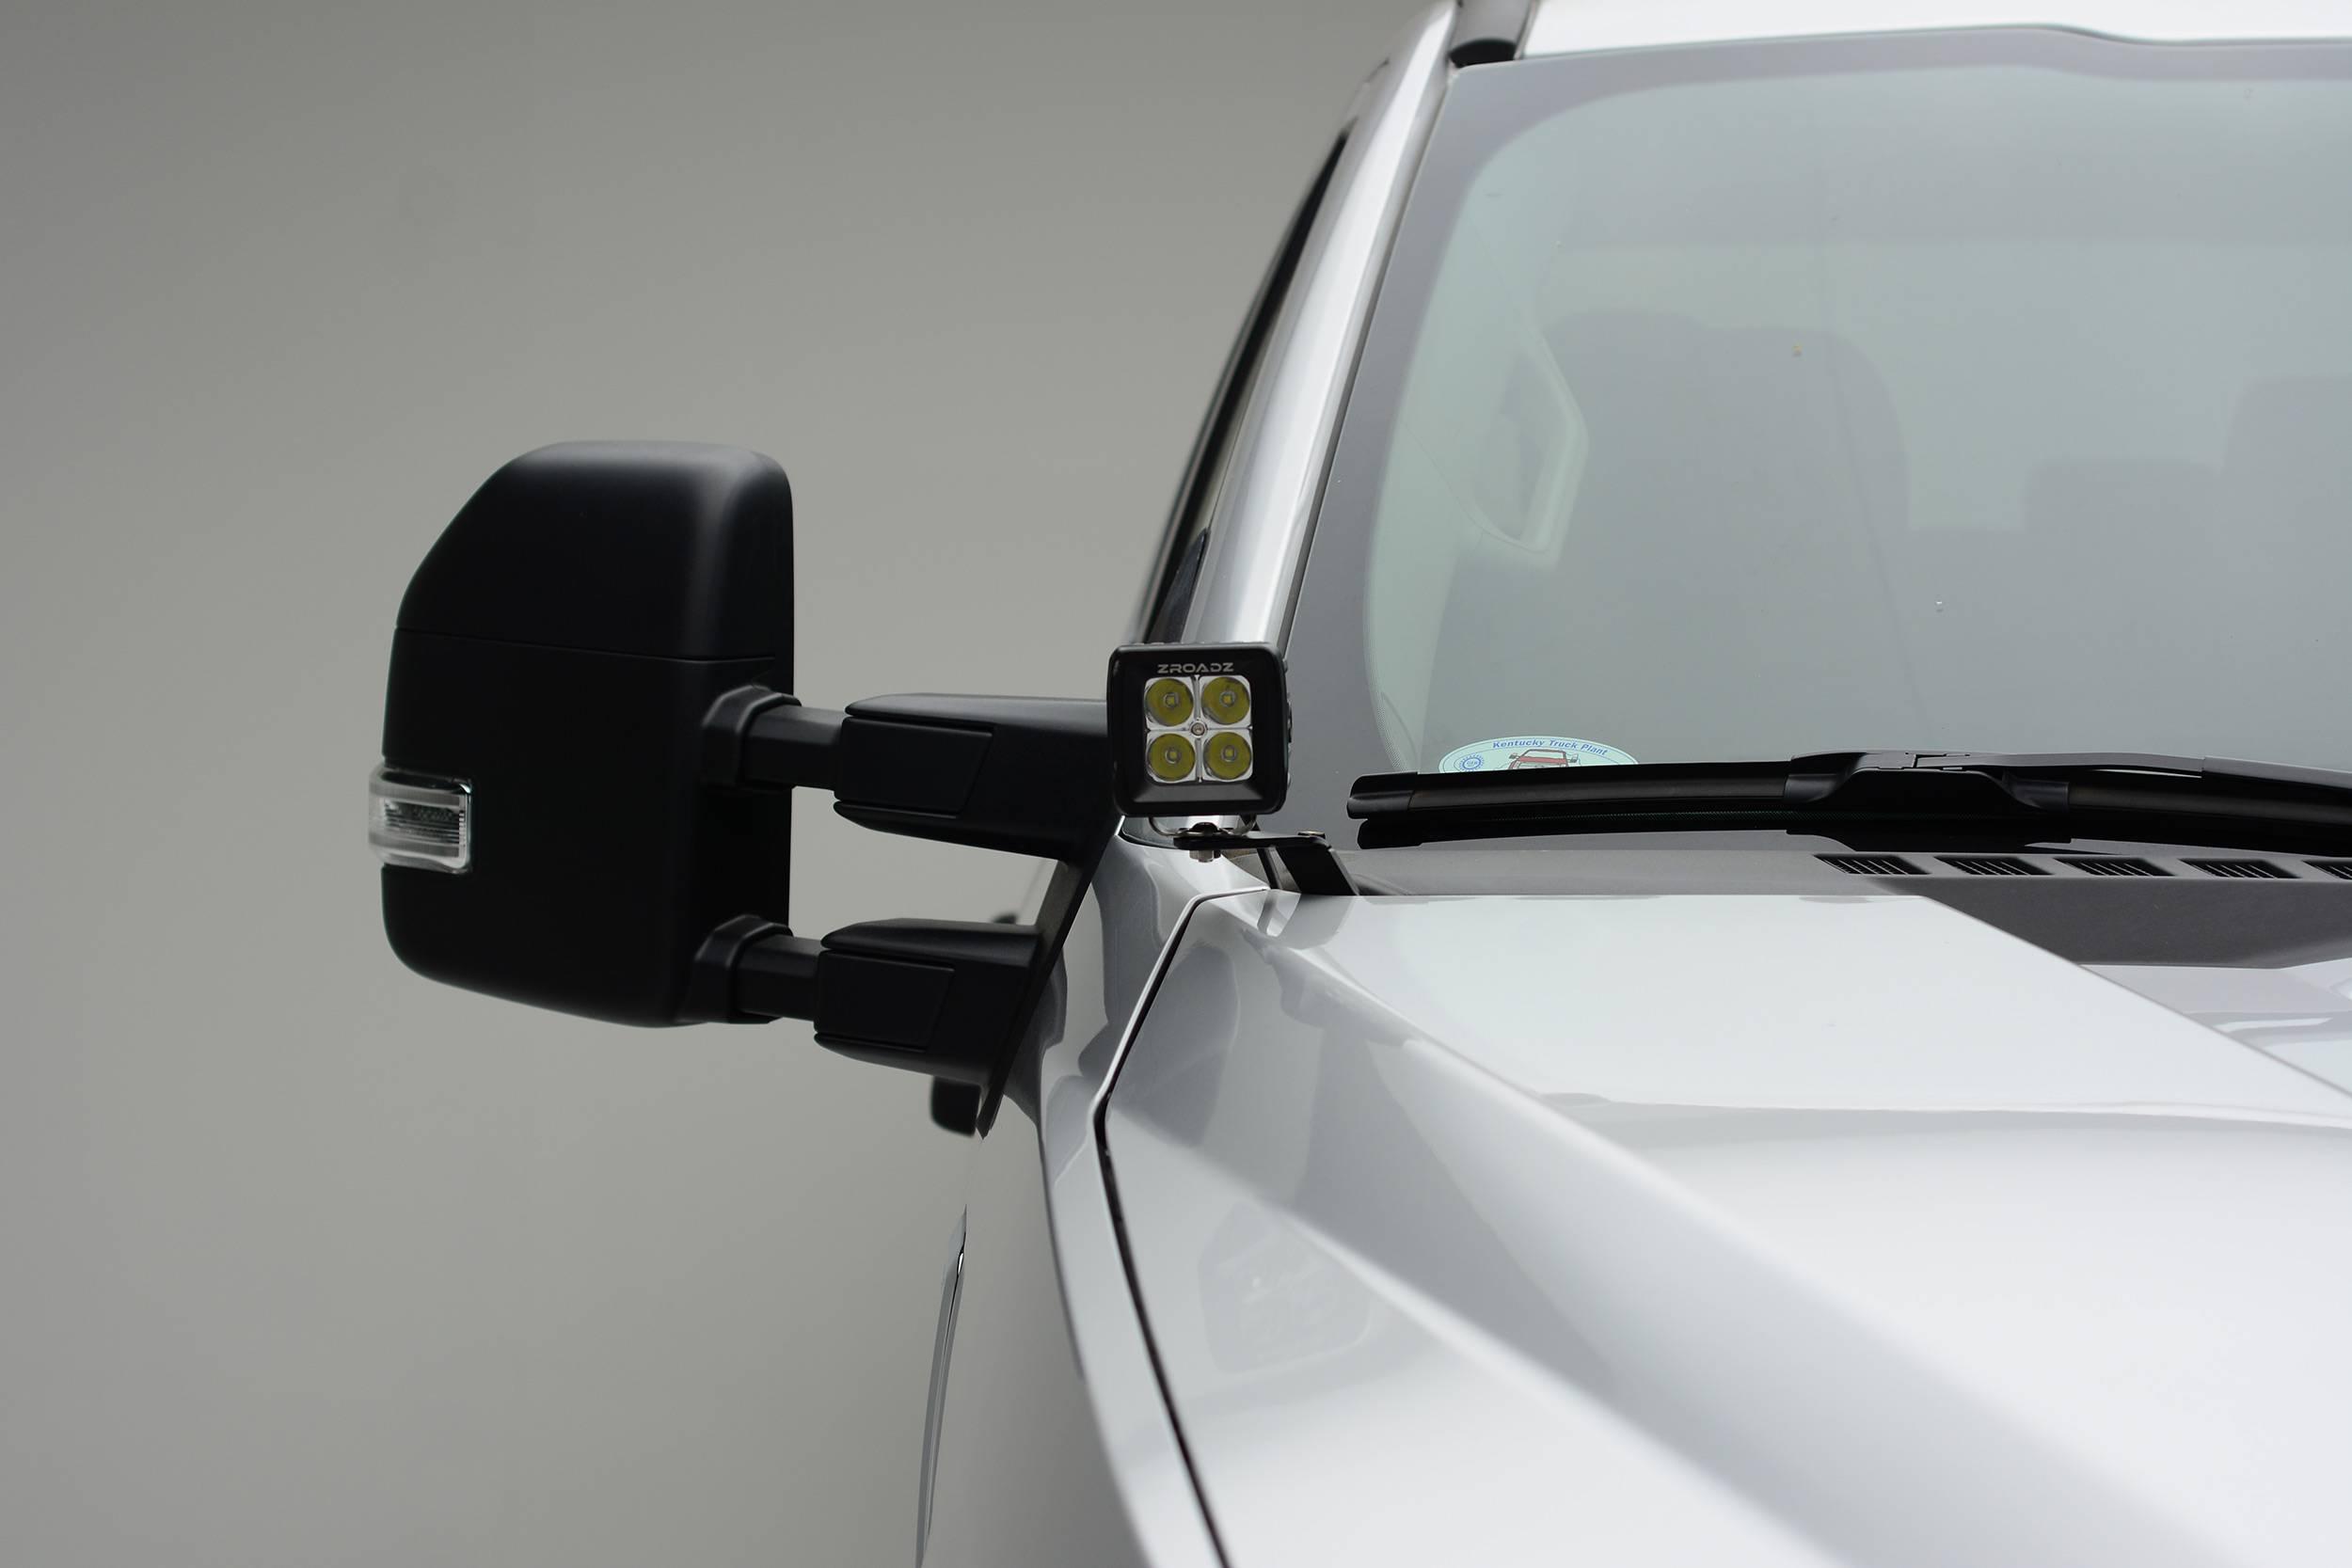 Genuine Hyundai 88271-38001-LK Seat Shield Cover Right Front